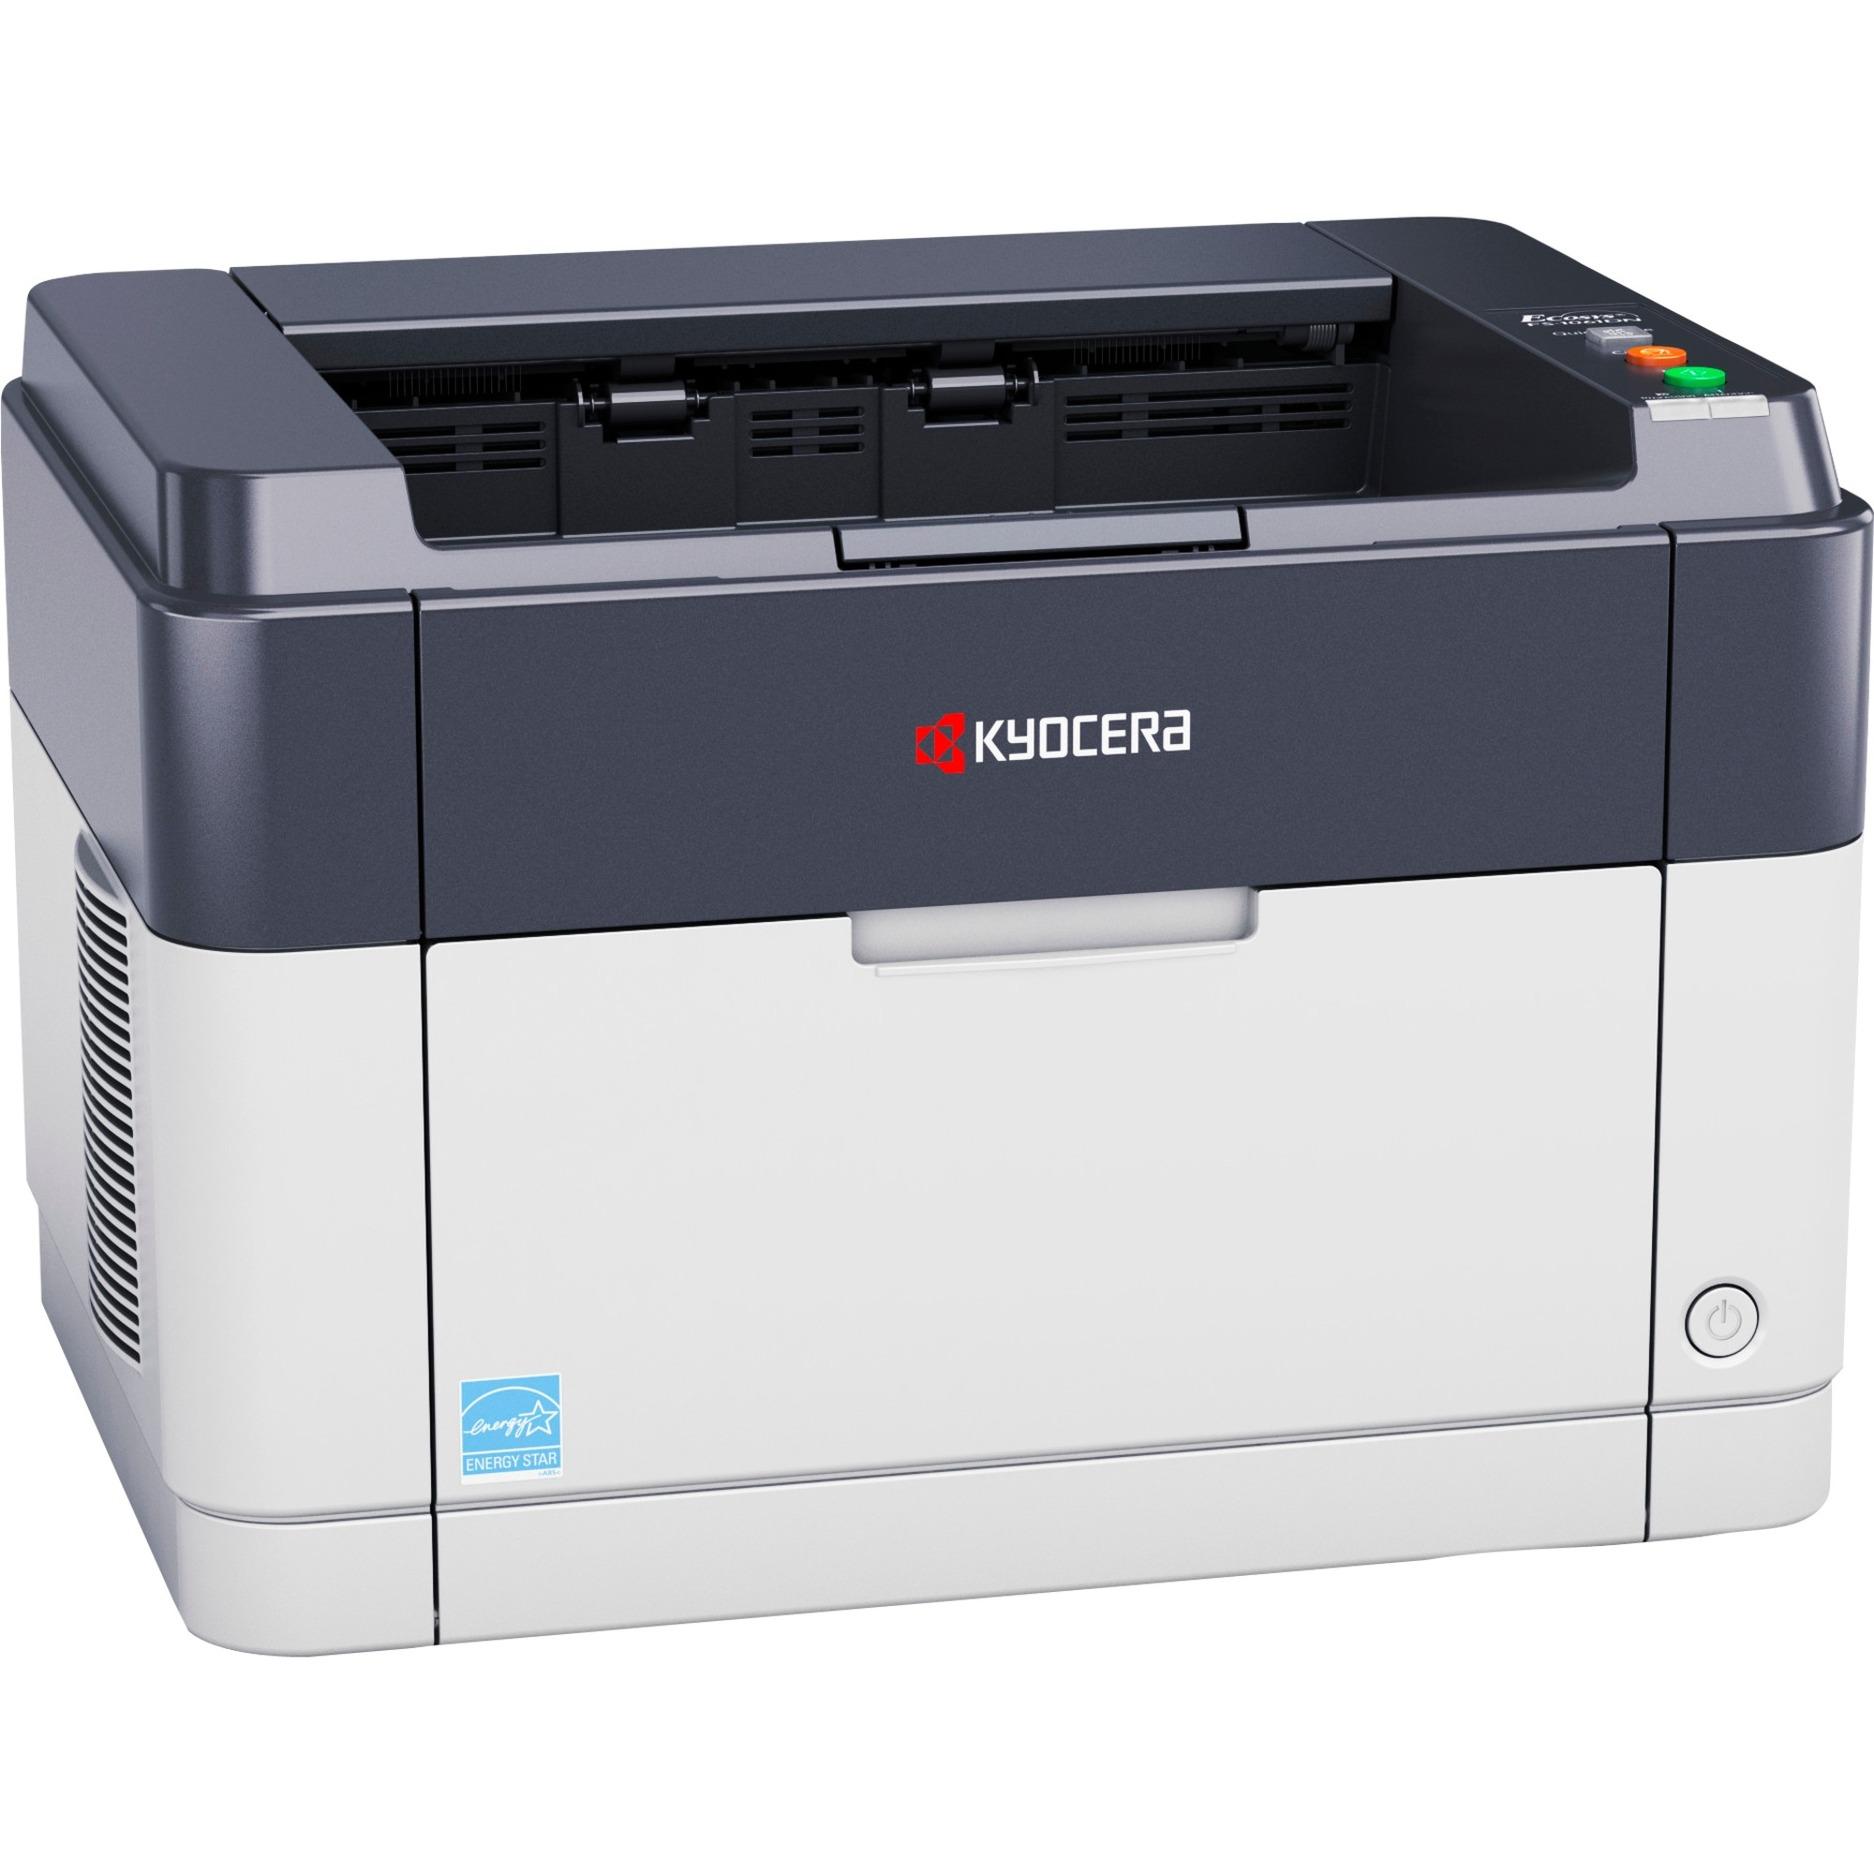 1102M33NL2, Impresora láser